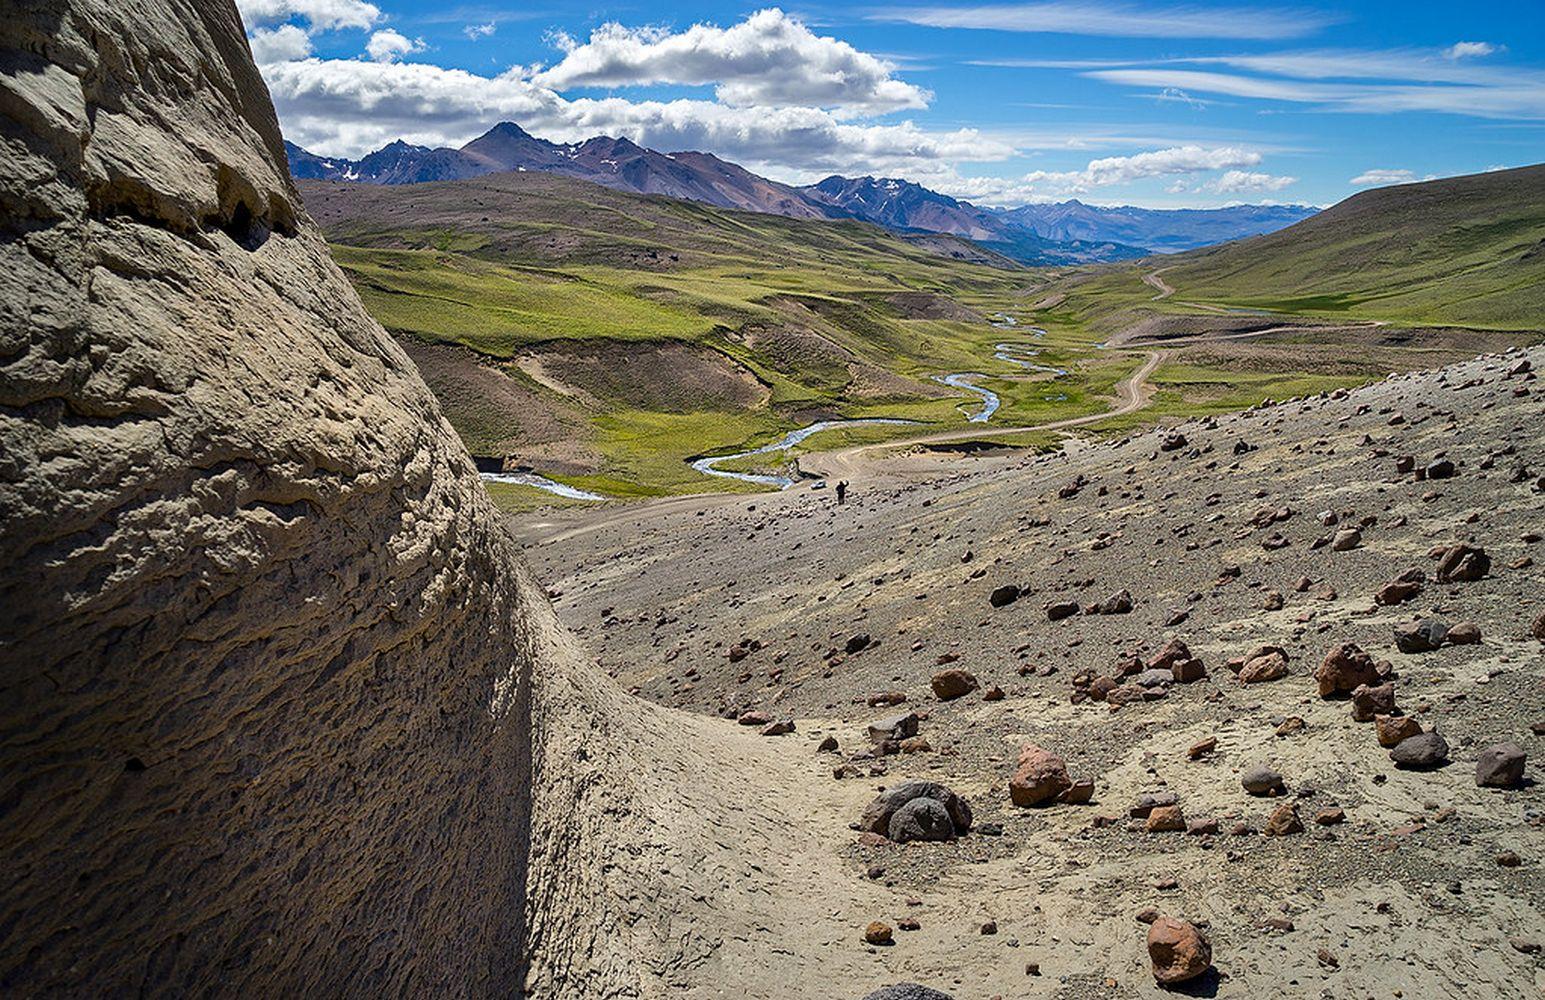 Road of Mount Zeballos, Patagonia